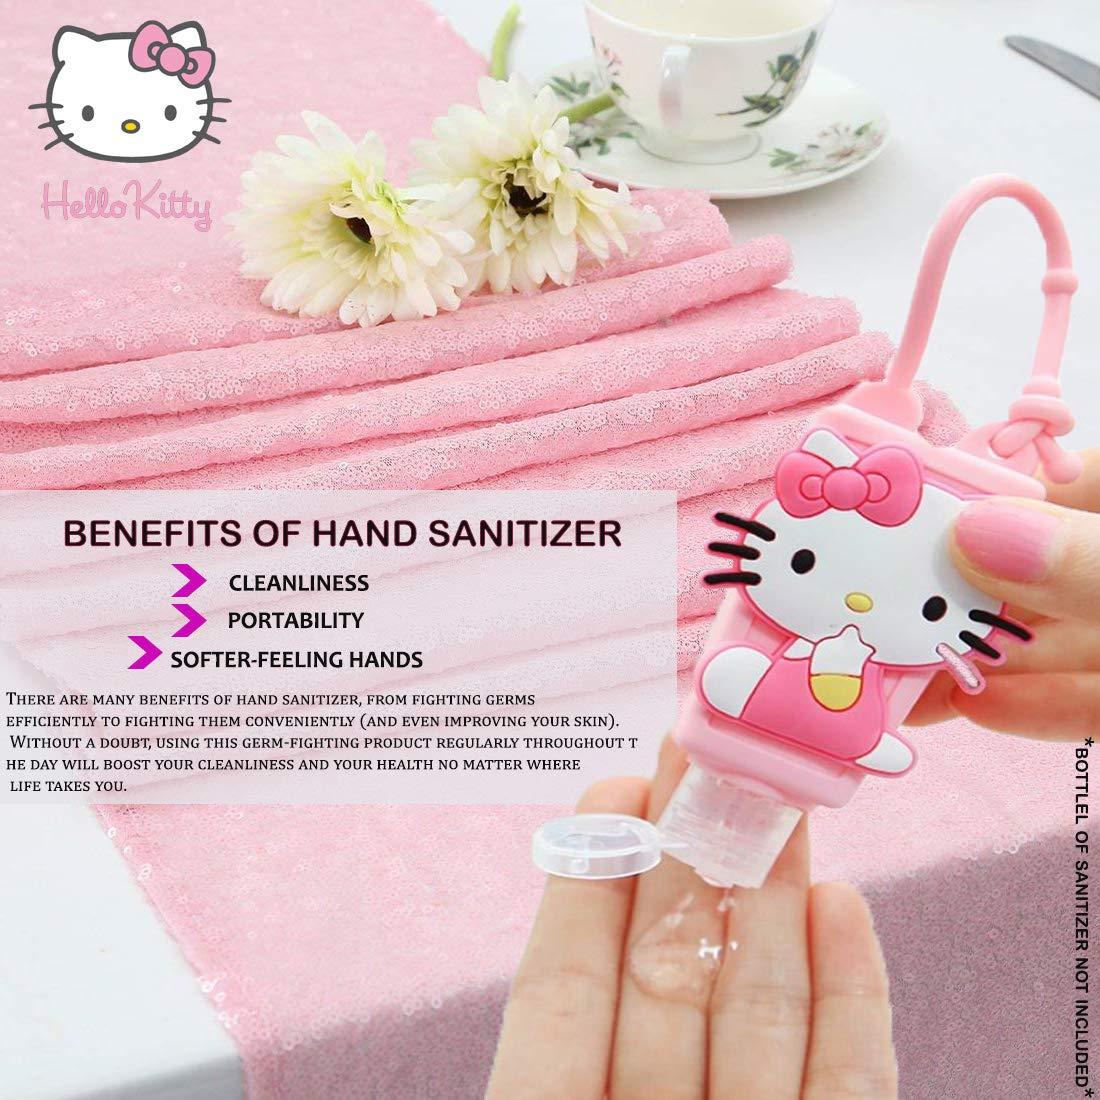 Amazon.com: Soporte para desinfectante de manos Pikachu para ...